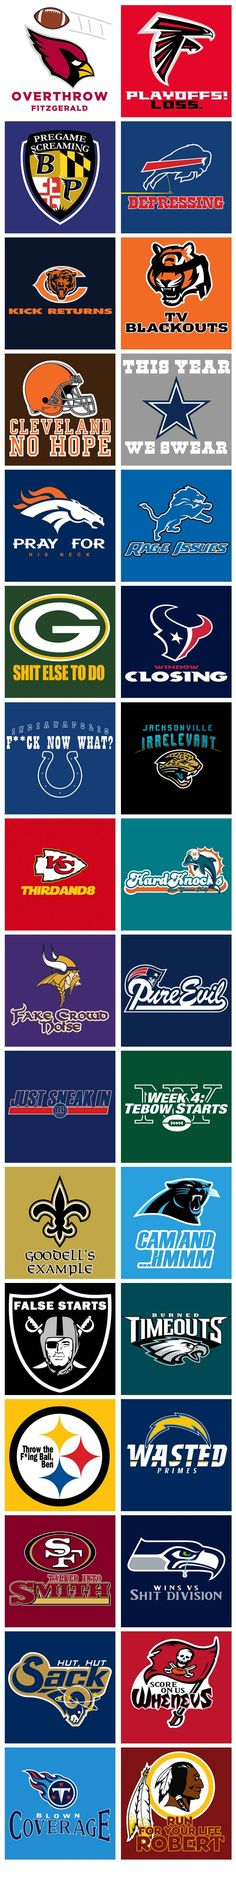 Honest NFL Logos @ Grantland